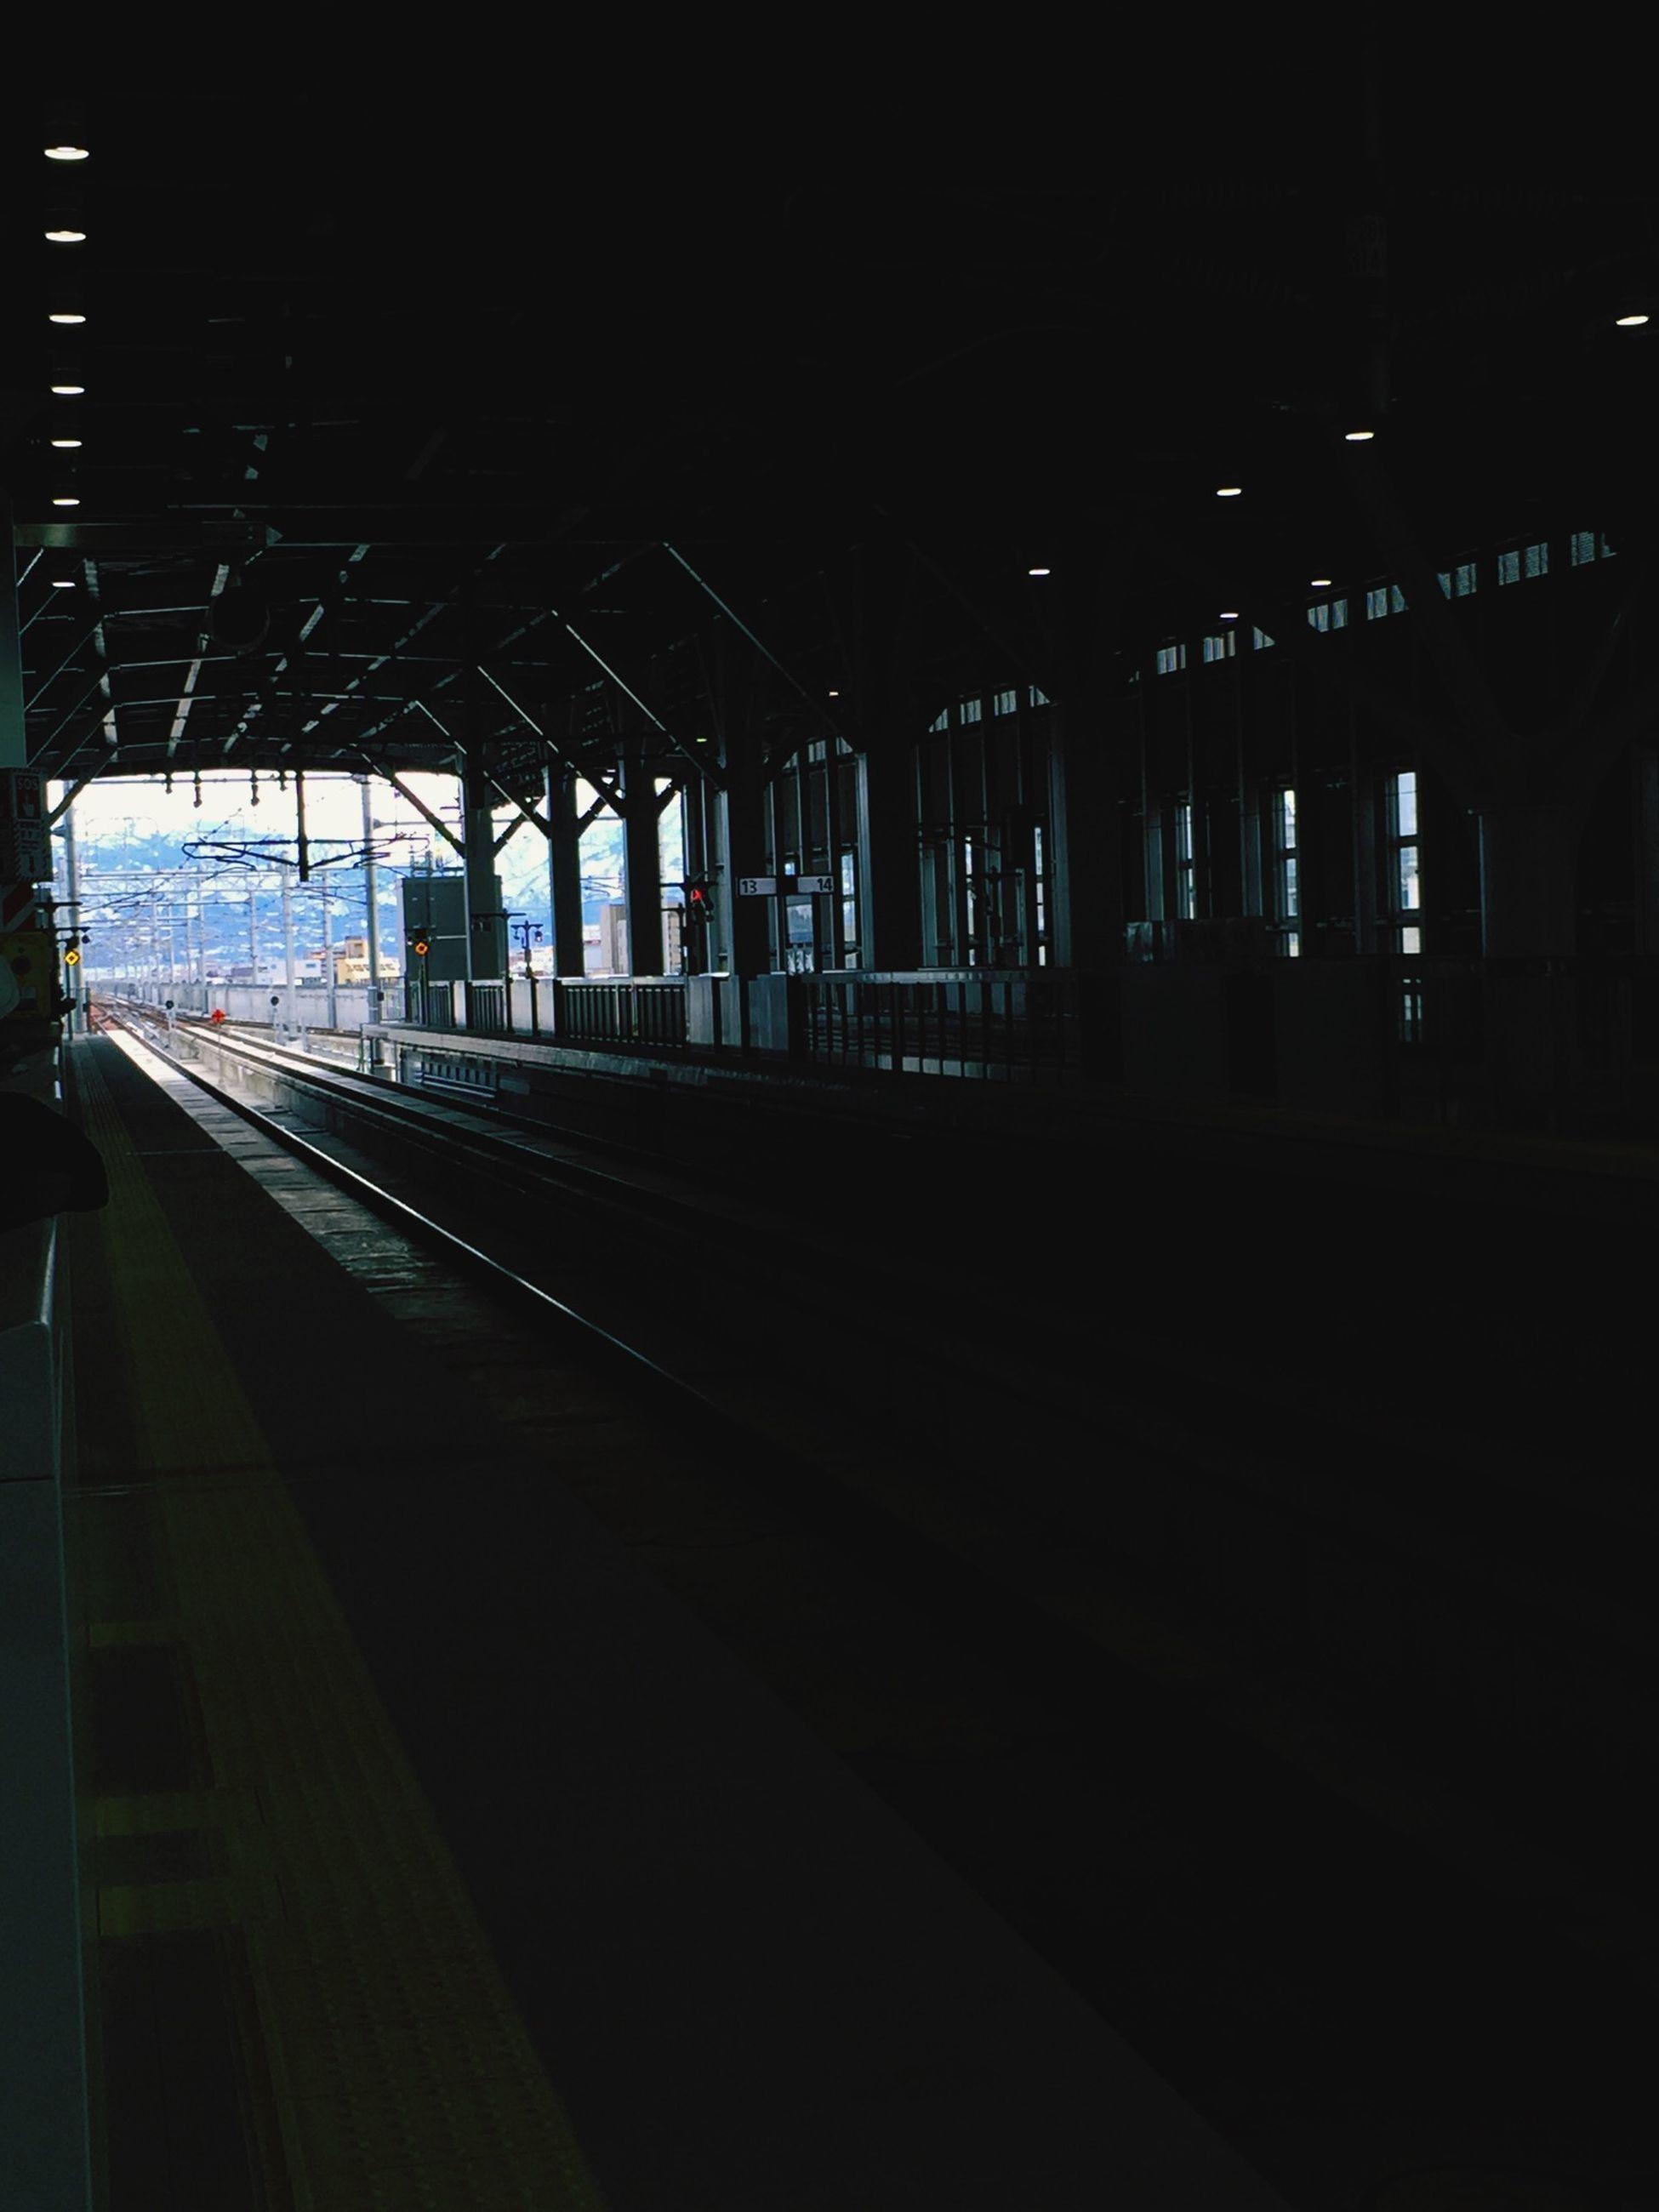 transportation, railroad track, railroad station, railroad station platform, rail transportation, public transportation, built structure, architecture, travel, dark, travel destinations, station, the way forward, long, day, straight, journey, subway station, interior, platform